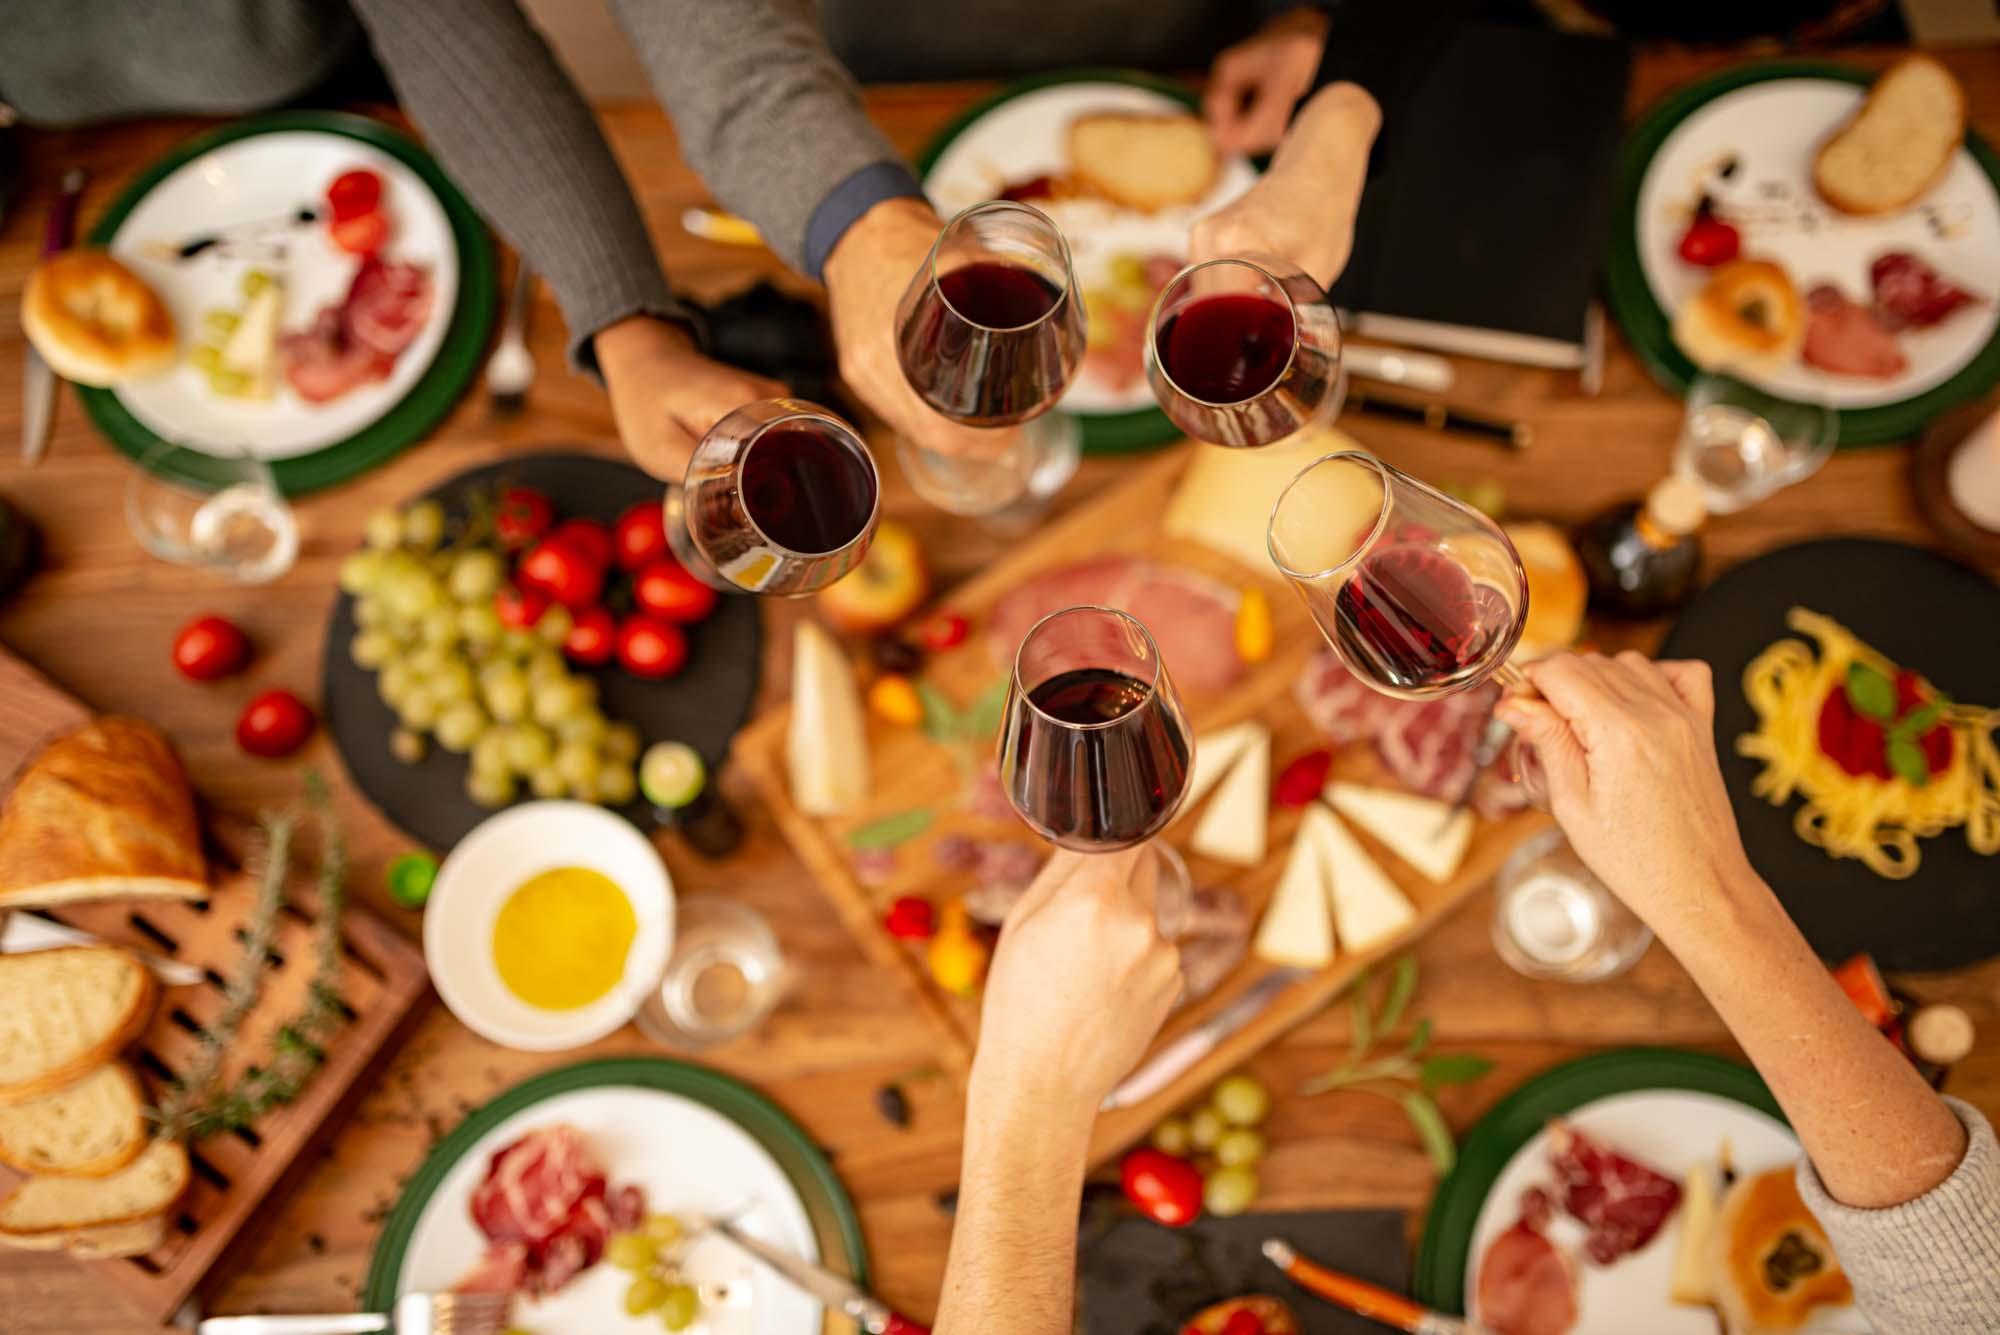 Cucina Amatoriale Formazione Manageriale a Ancona